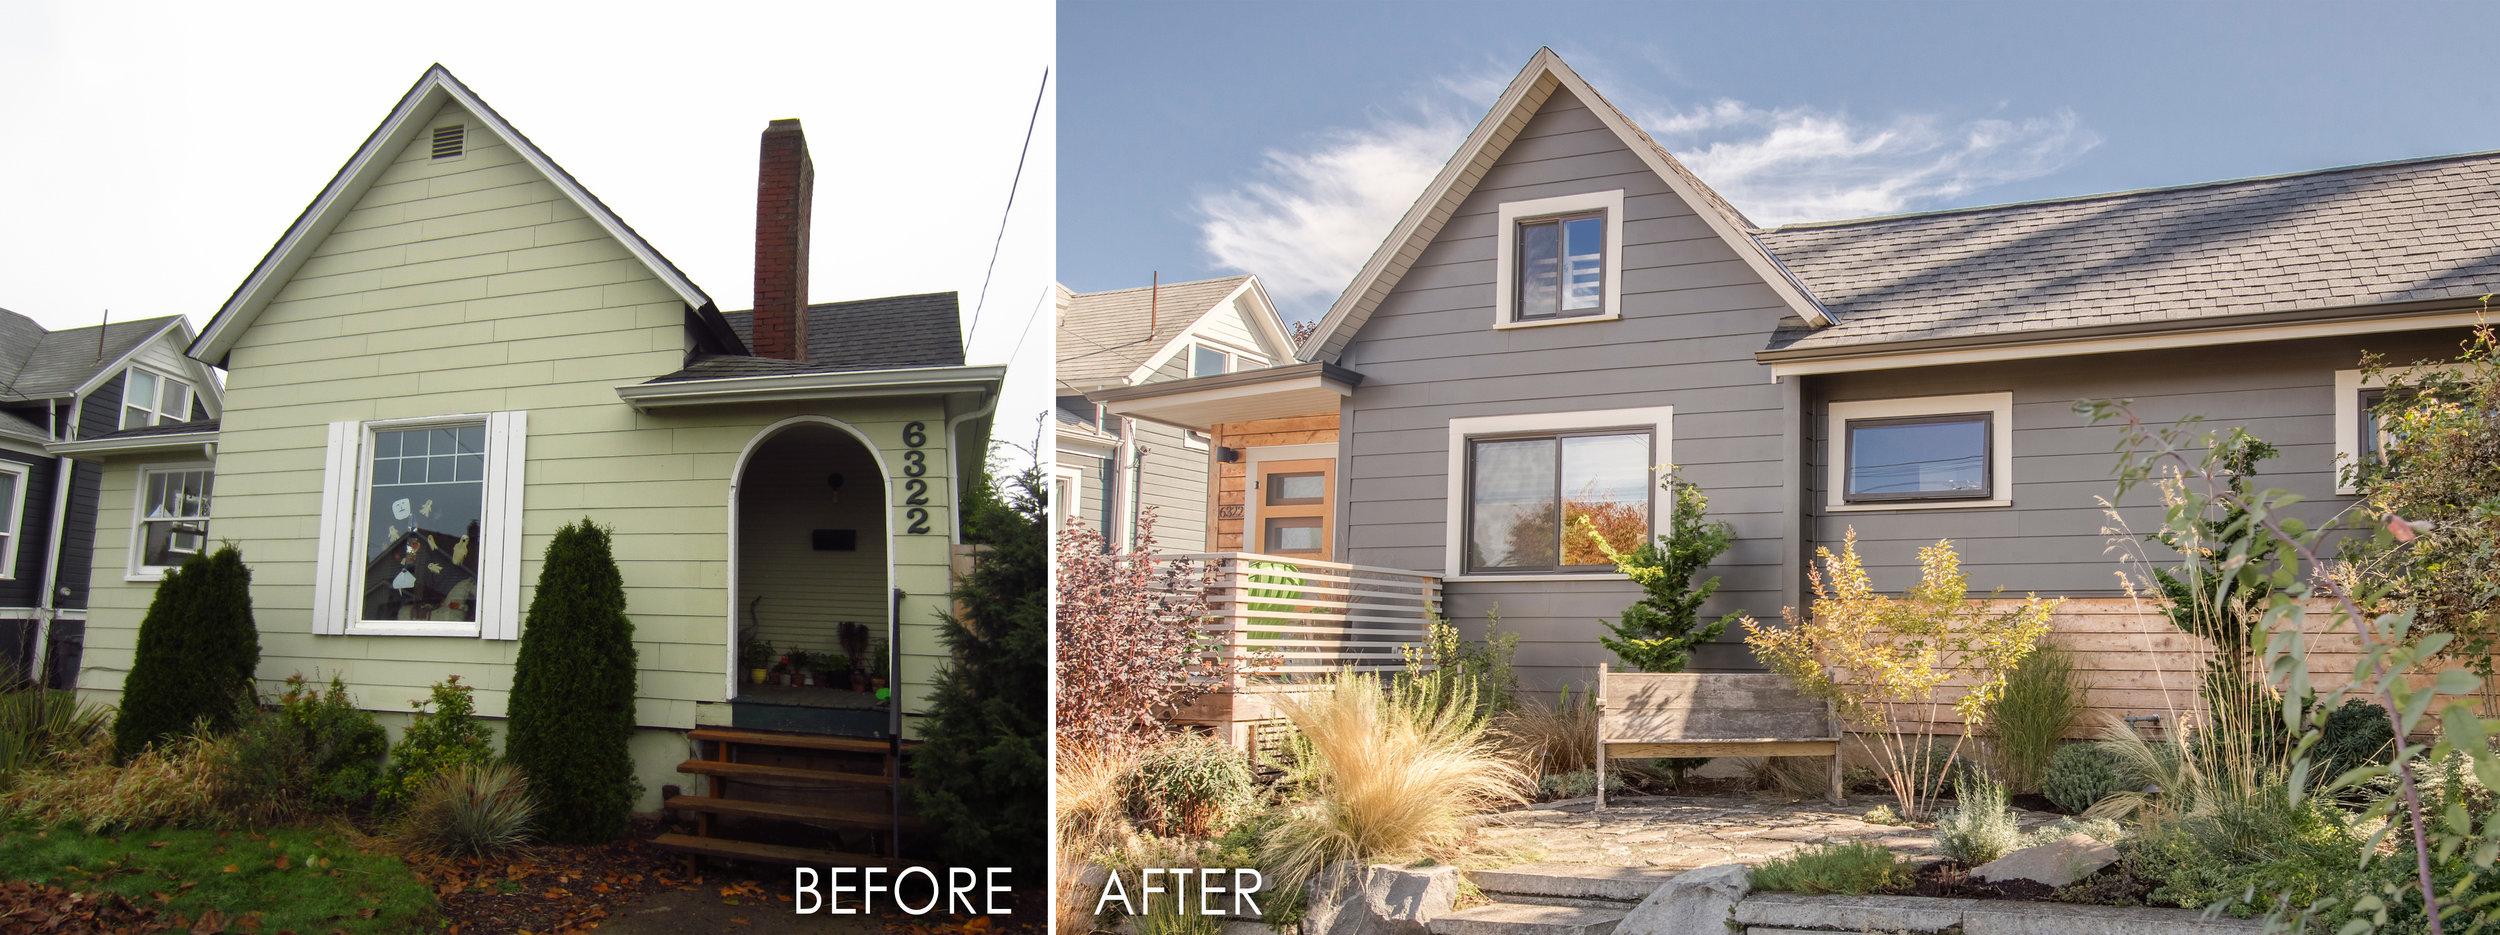 Harka Architecture - Arbor Lodge - Custom Home Remodel (6).jpg